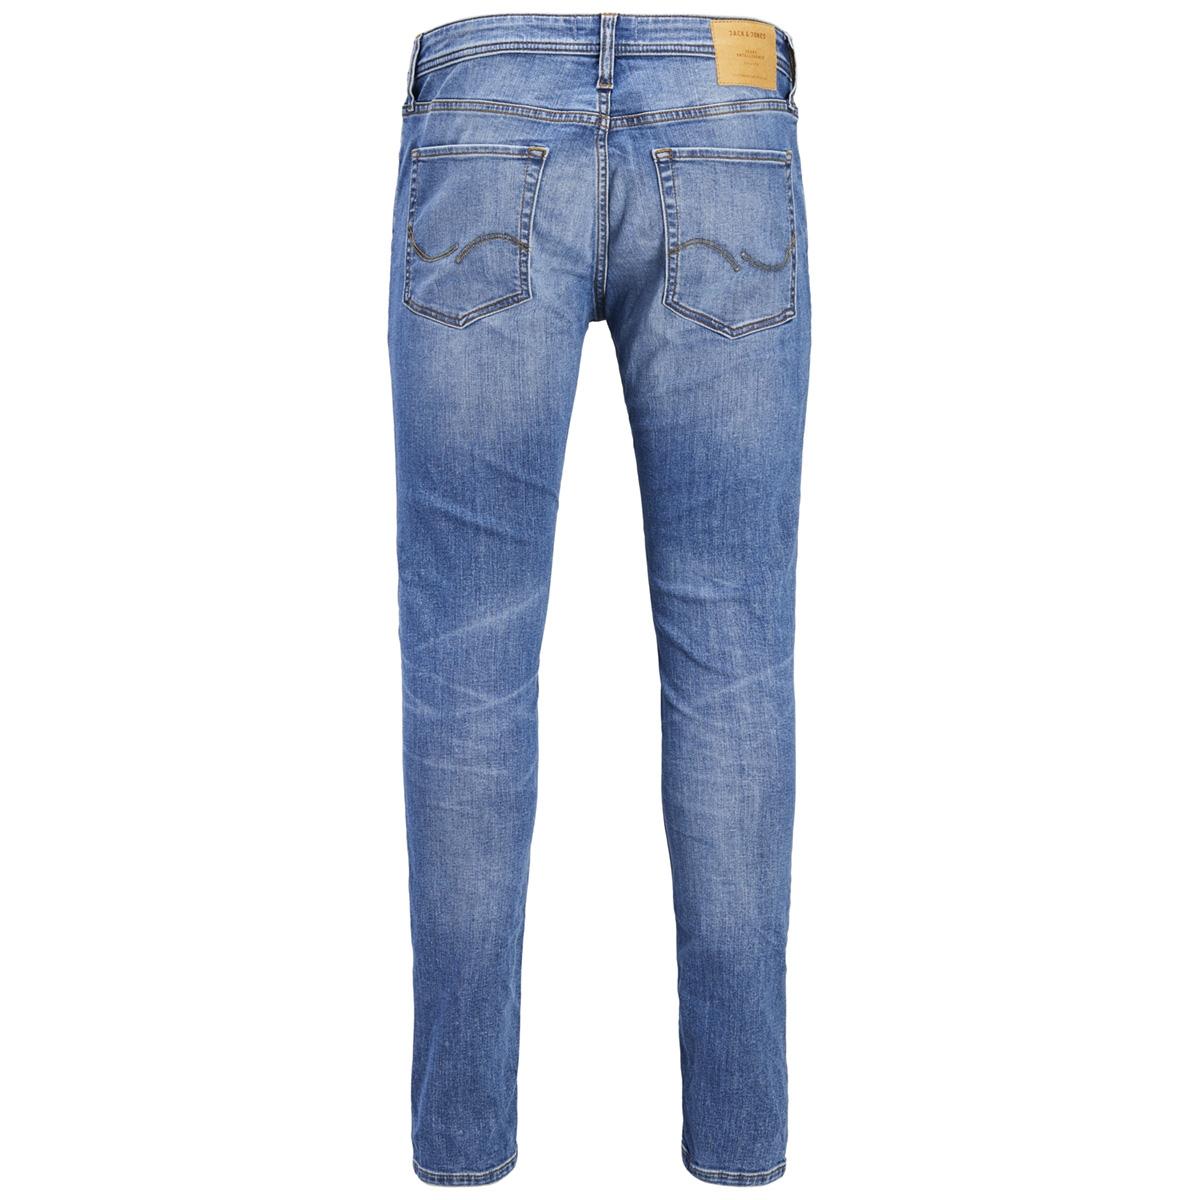 jjitim jjoriginal am 815 12148911 jack & jones jeans blue denim